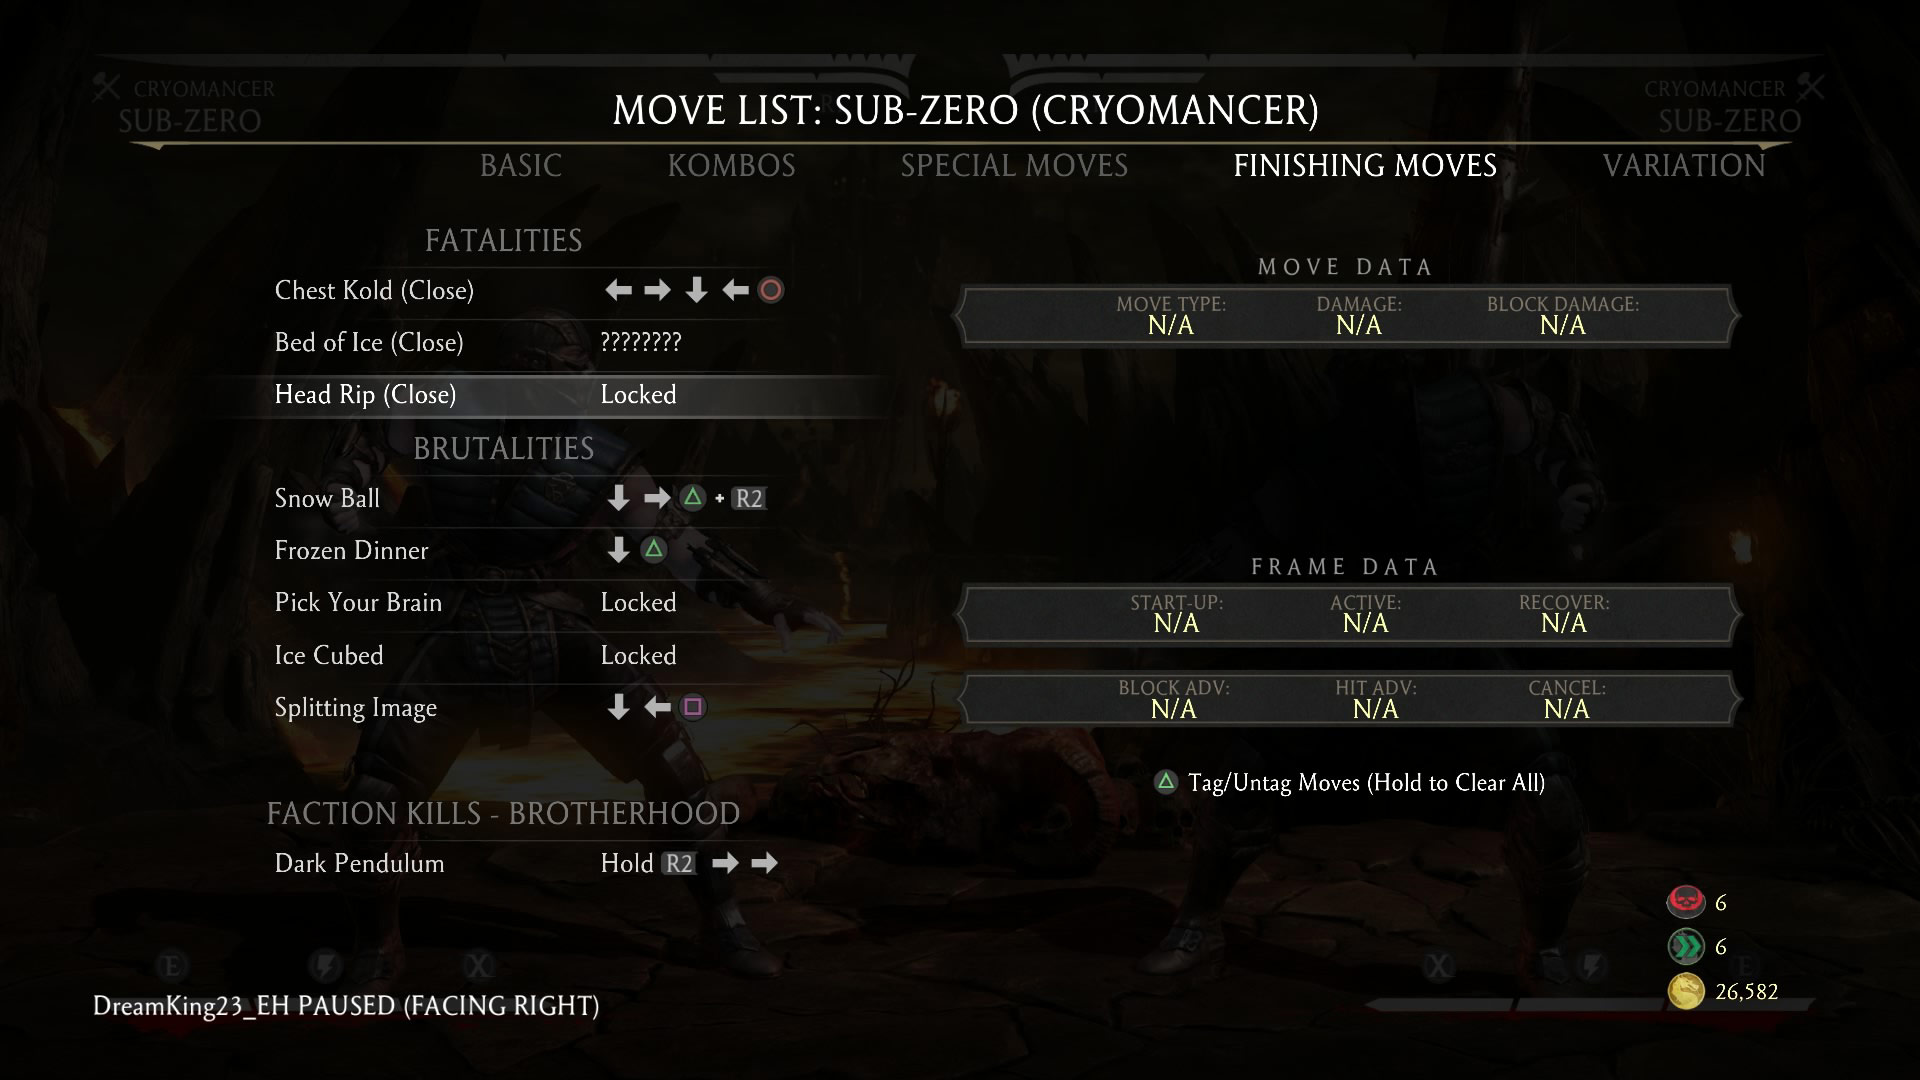 Mortal Kombat X Klassic Fatalities For Scorpion Sonya Sub Zero